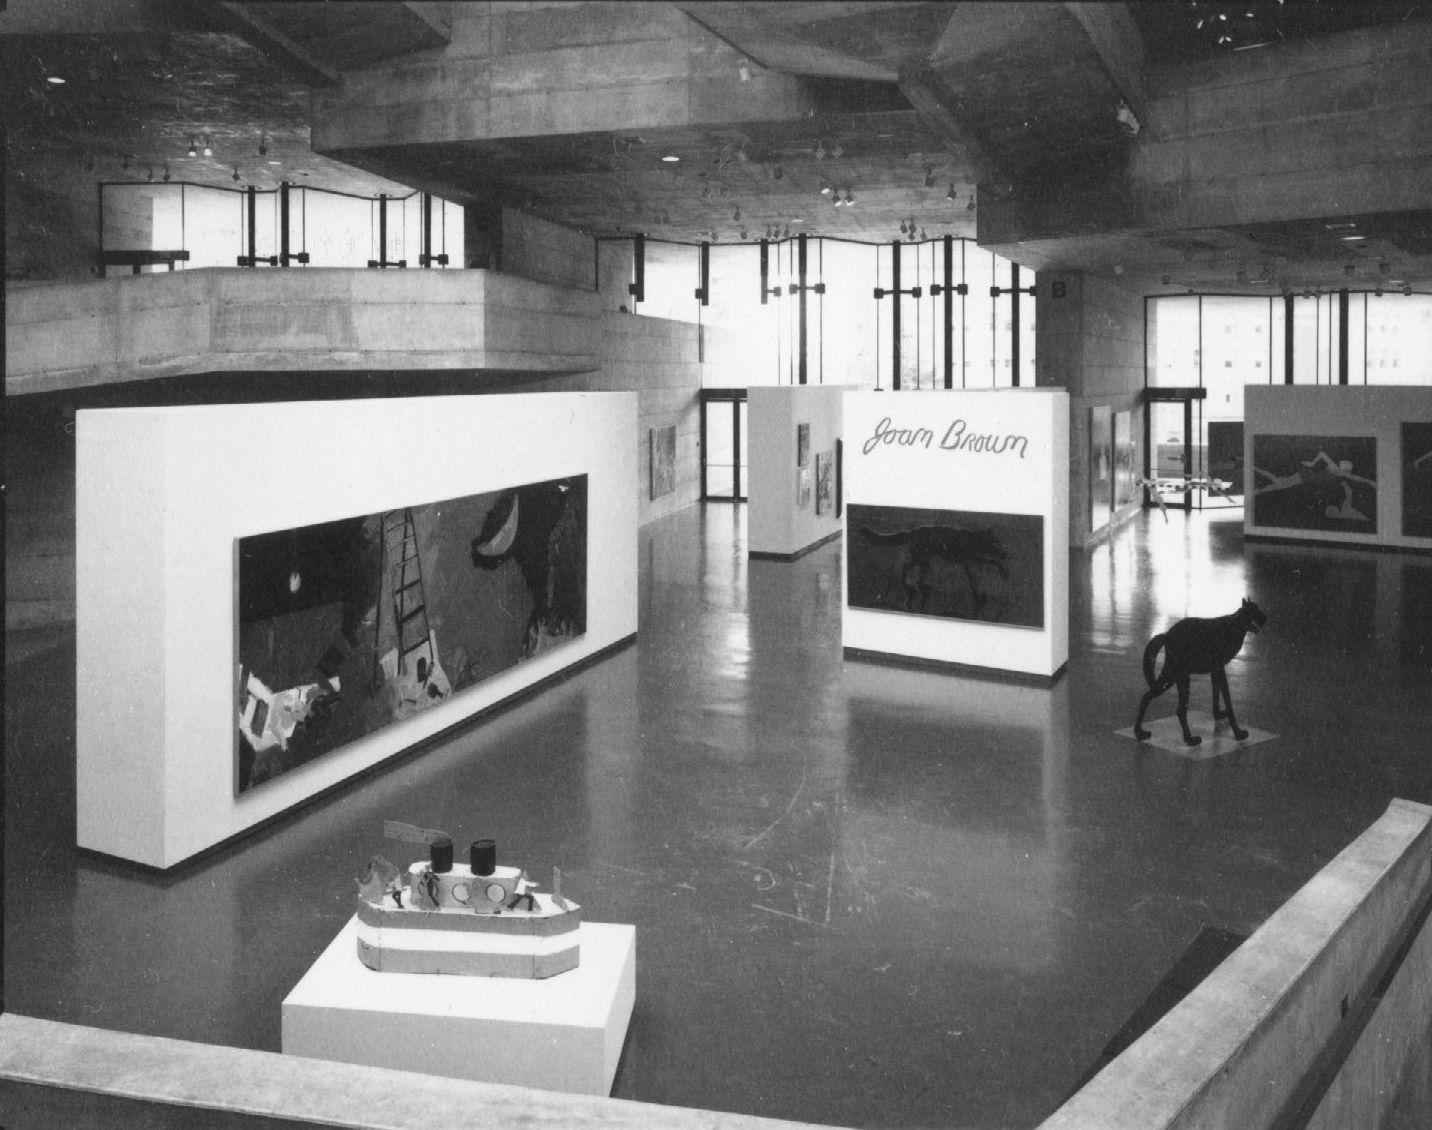 University Art Museum, University of California, Berkeley, Joan Brown, 1974 3.jpg